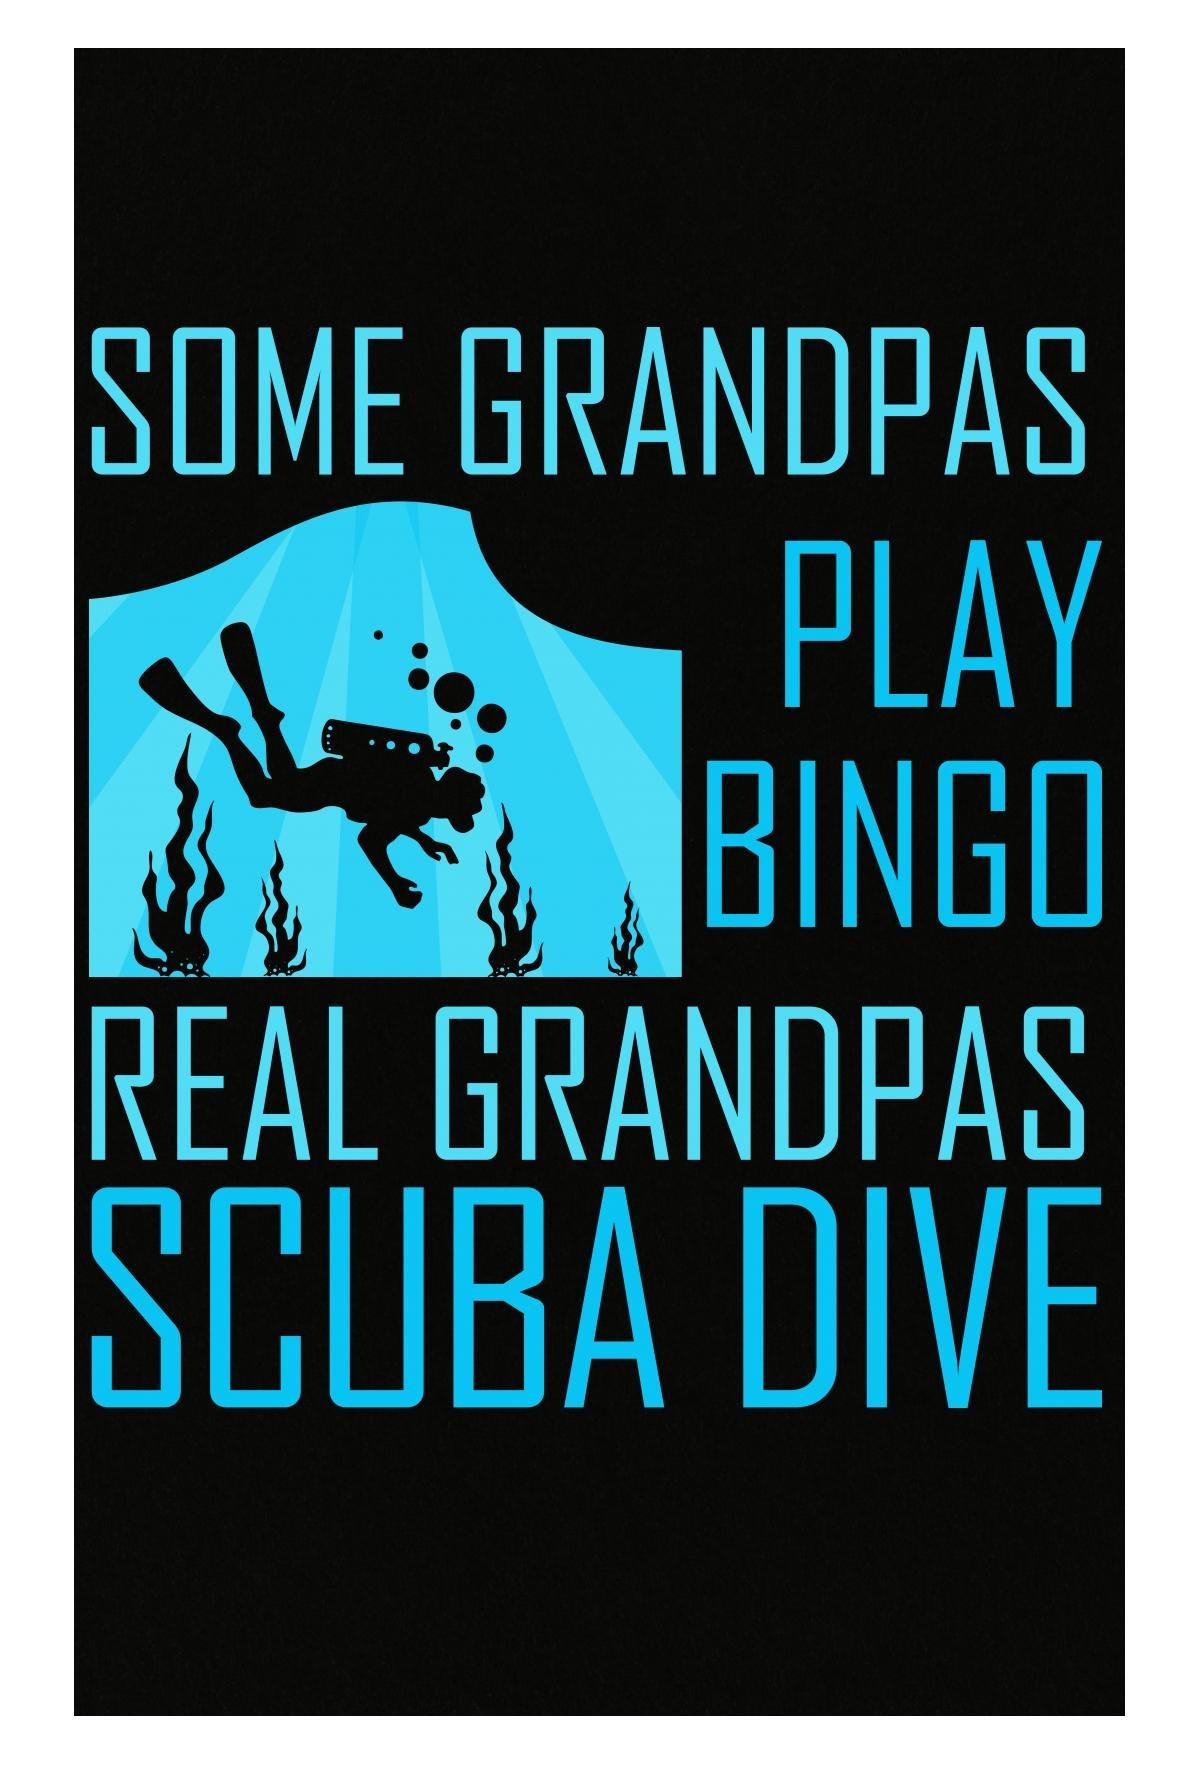 AttireOutfit Some Grandpas Play Bingo Real Grandpas Scuba Dive - Poster